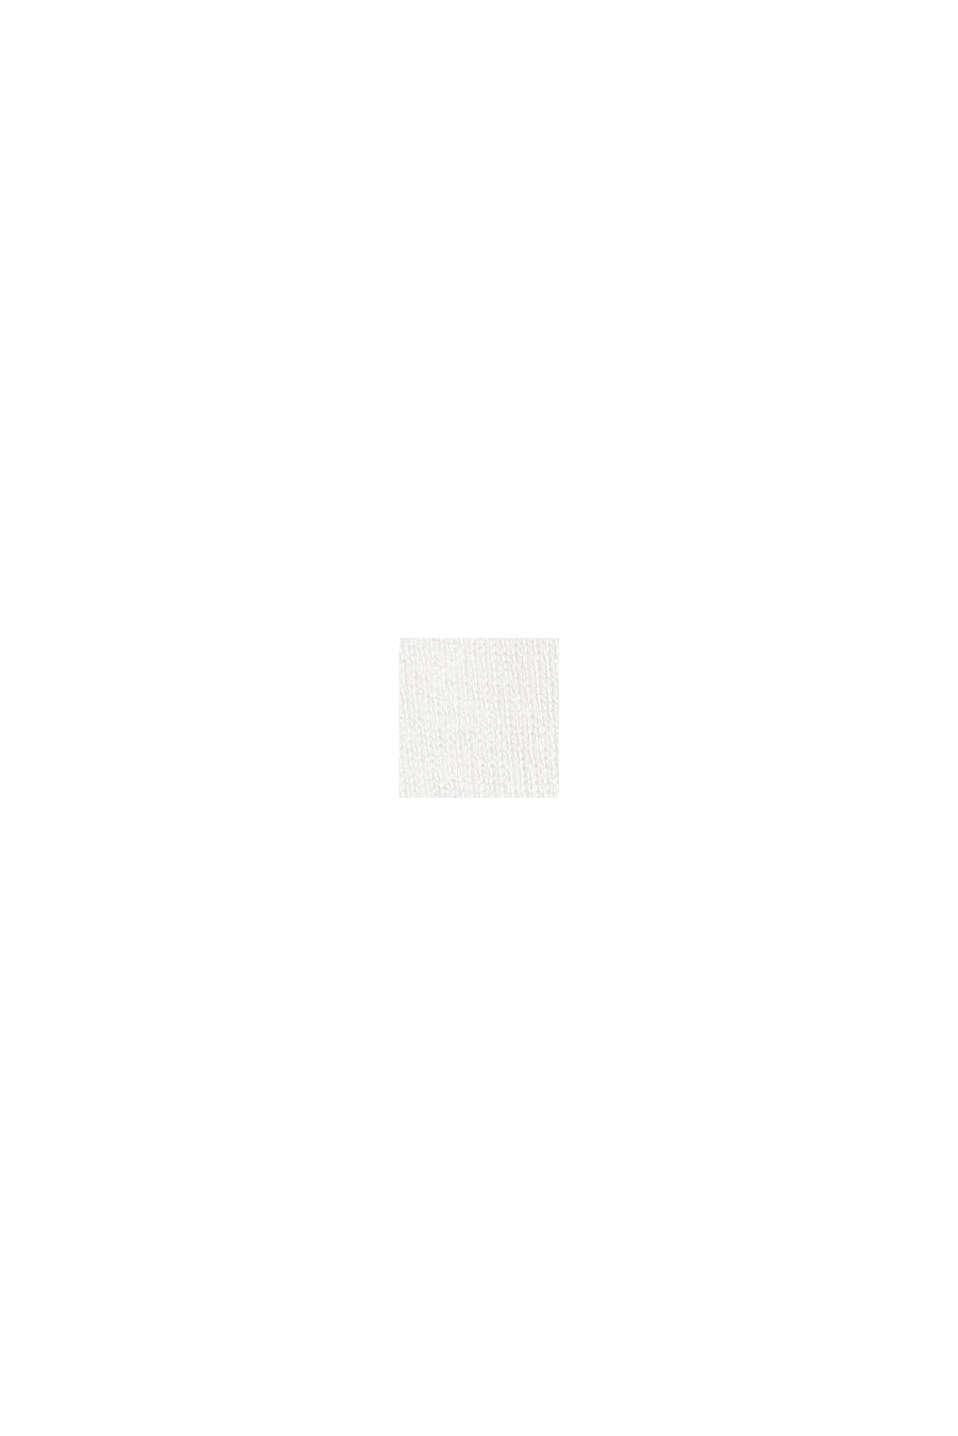 Pull-over en coton bio mélangé, NEW OFF WHITE, swatch